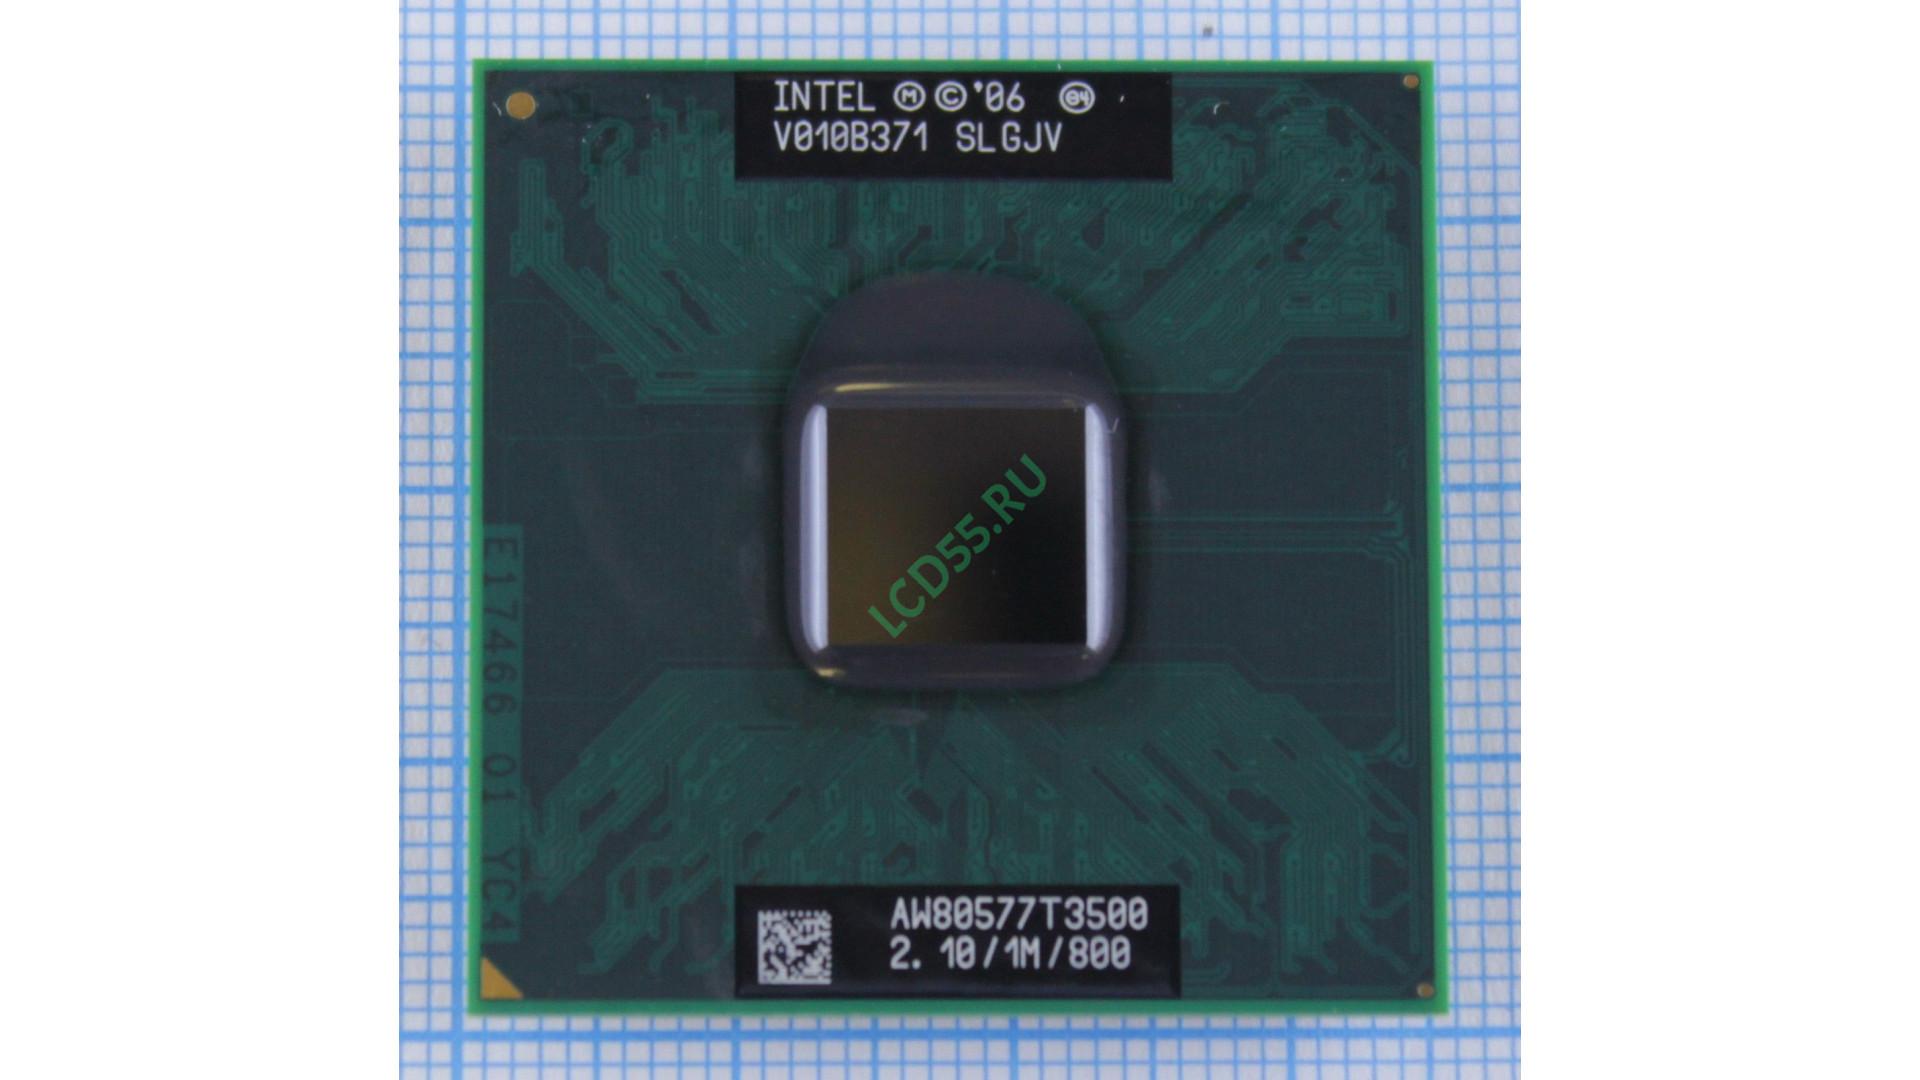 Intel T3500 SLGJV